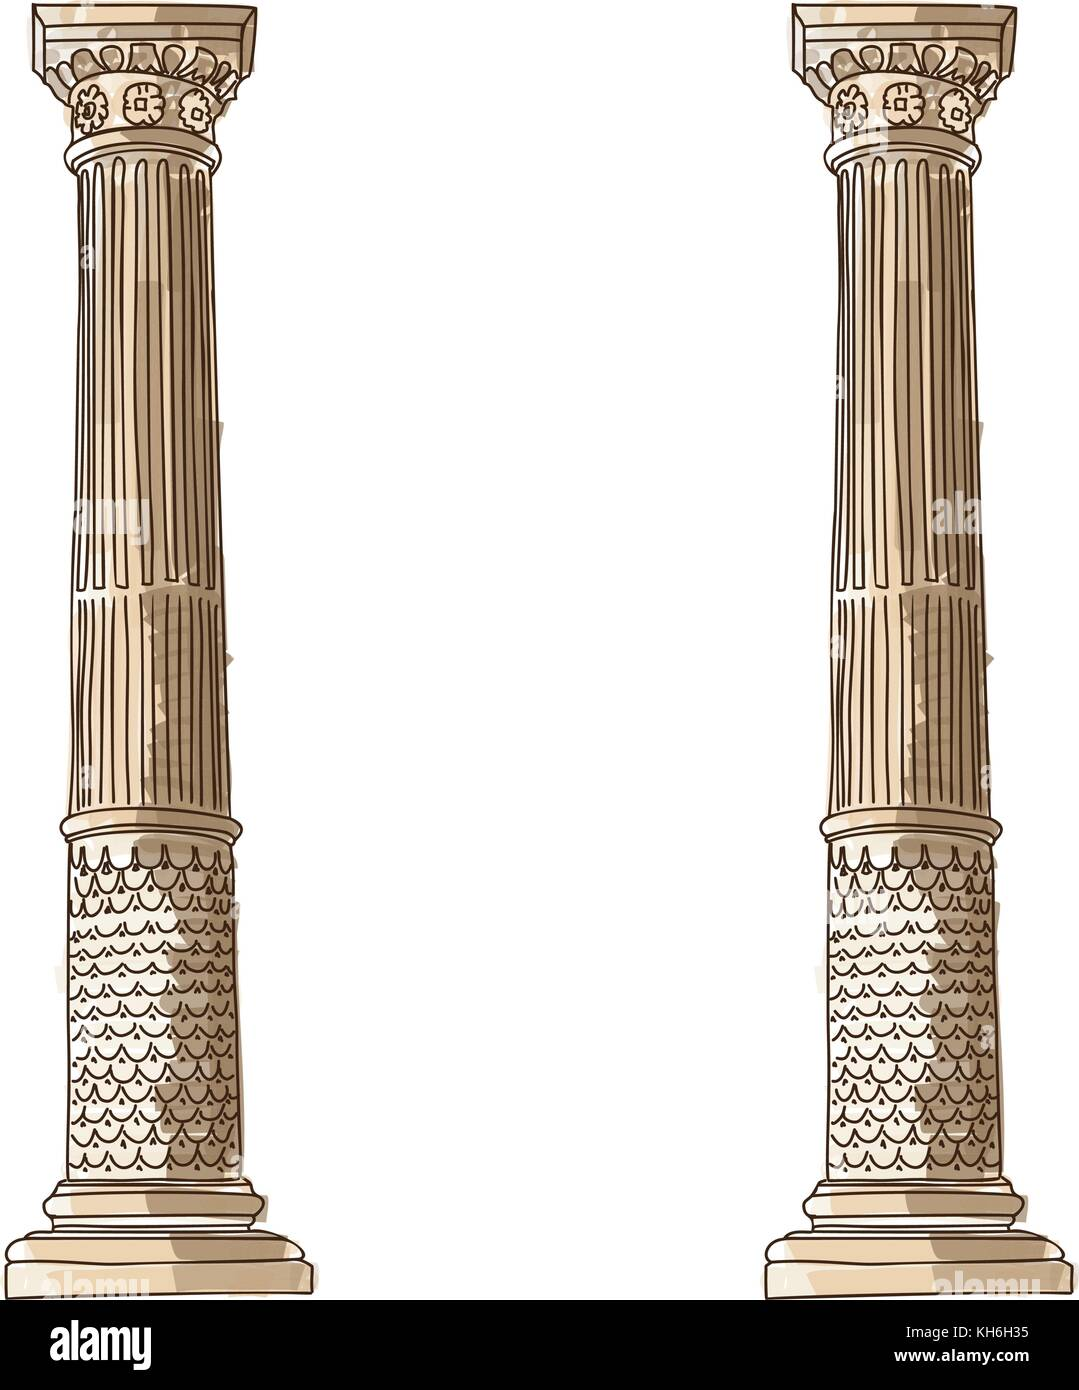 Doric Ionic Corinthian Order Greek Architecture Doric